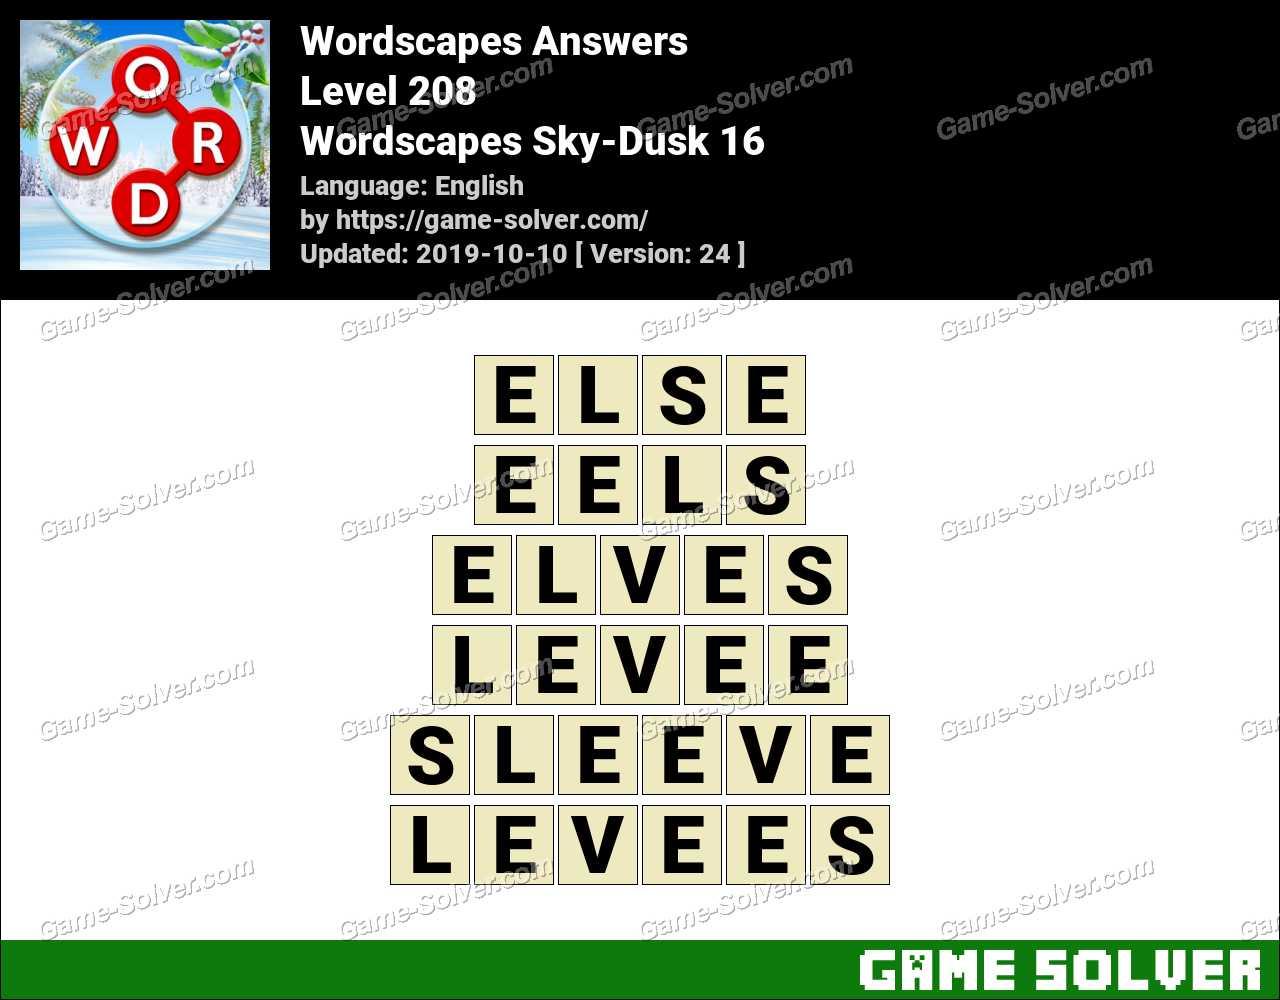 Wordscapes Sky-Dusk 16 Answers